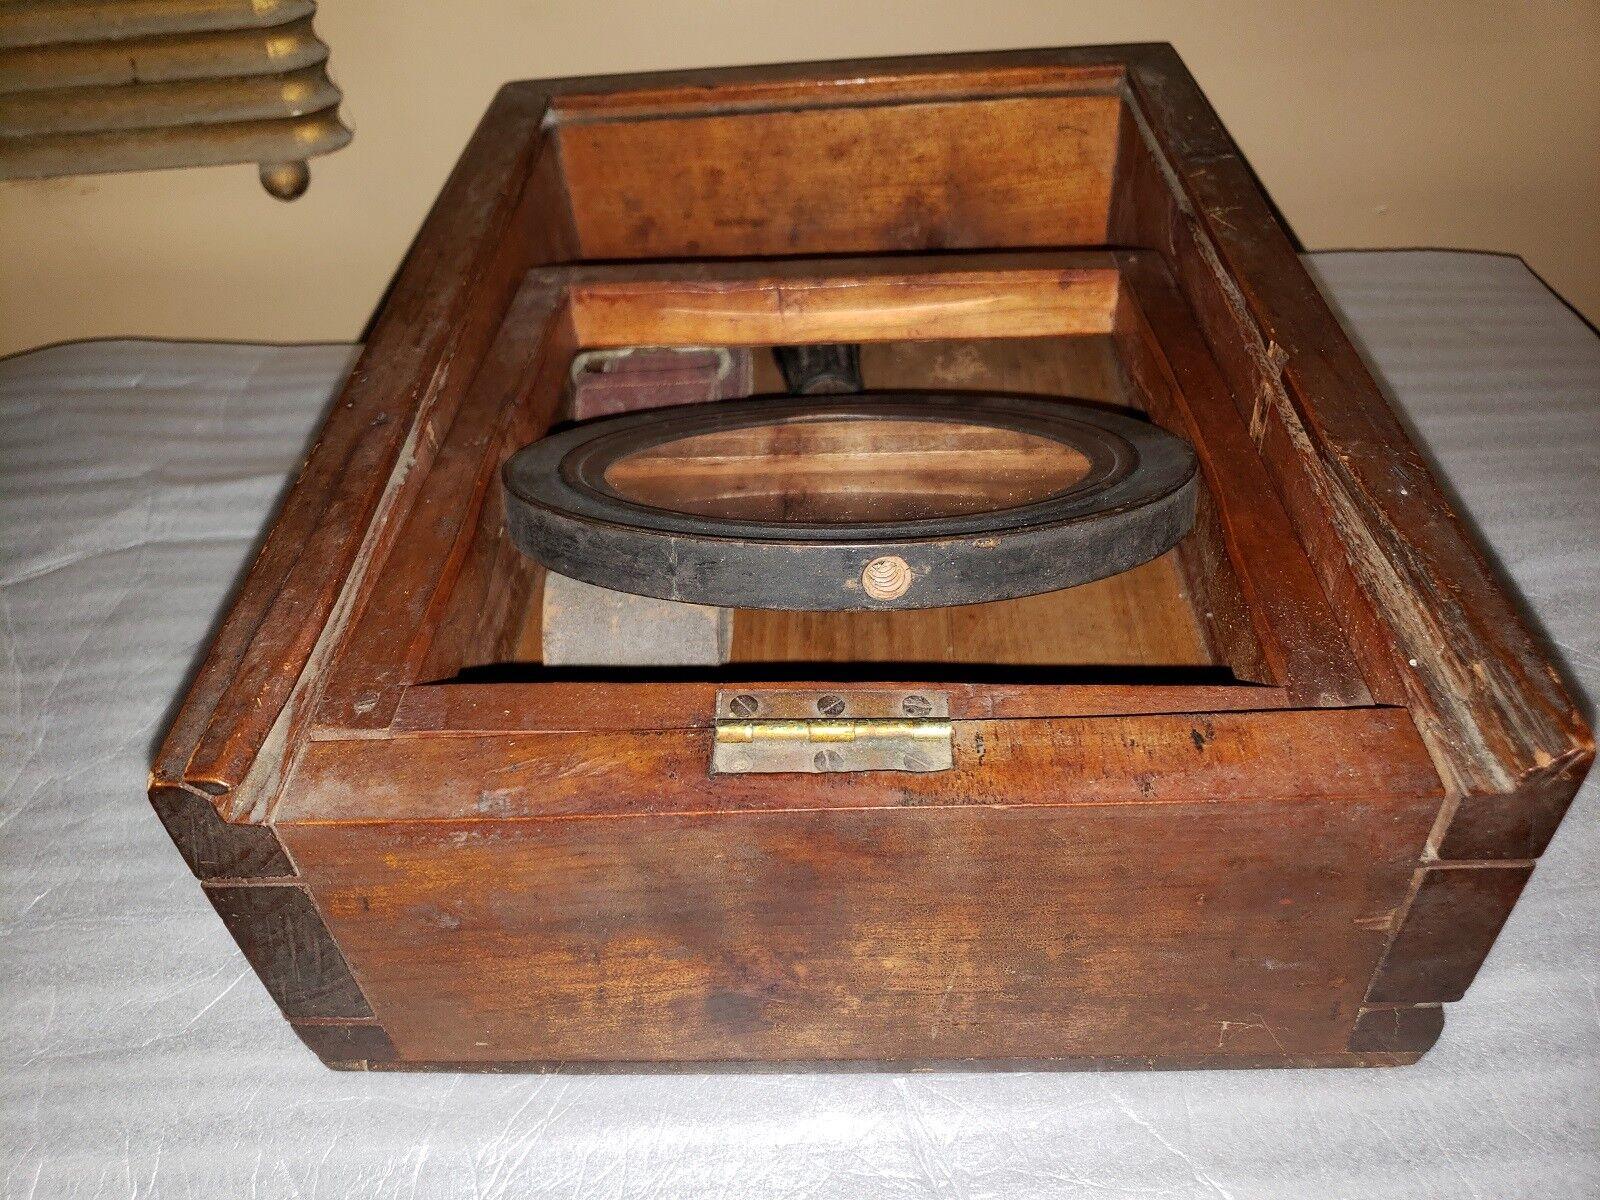 Mid 1800's He Dovetailed Cele scatola style Field Shaving scatola